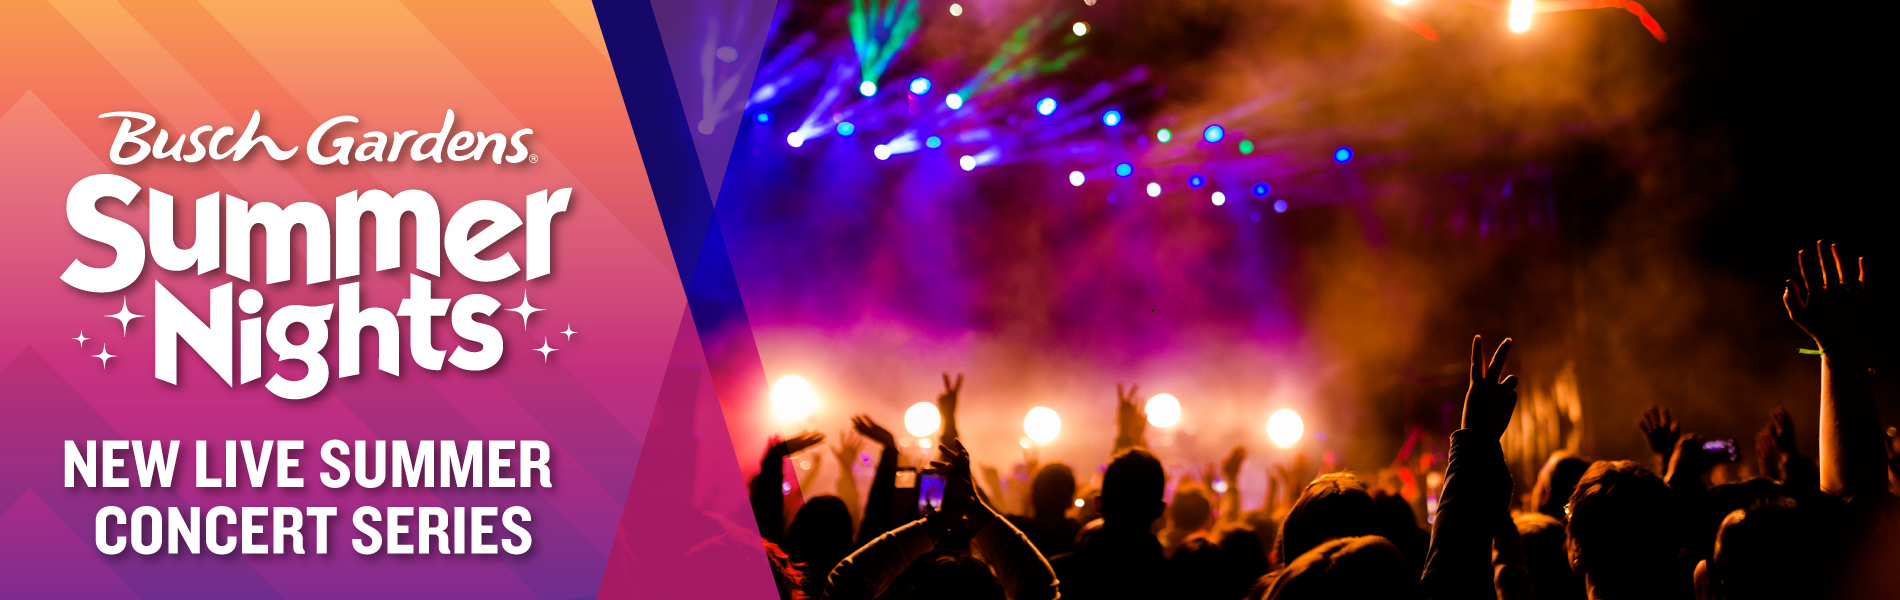 All-New Live Summer Concert Series